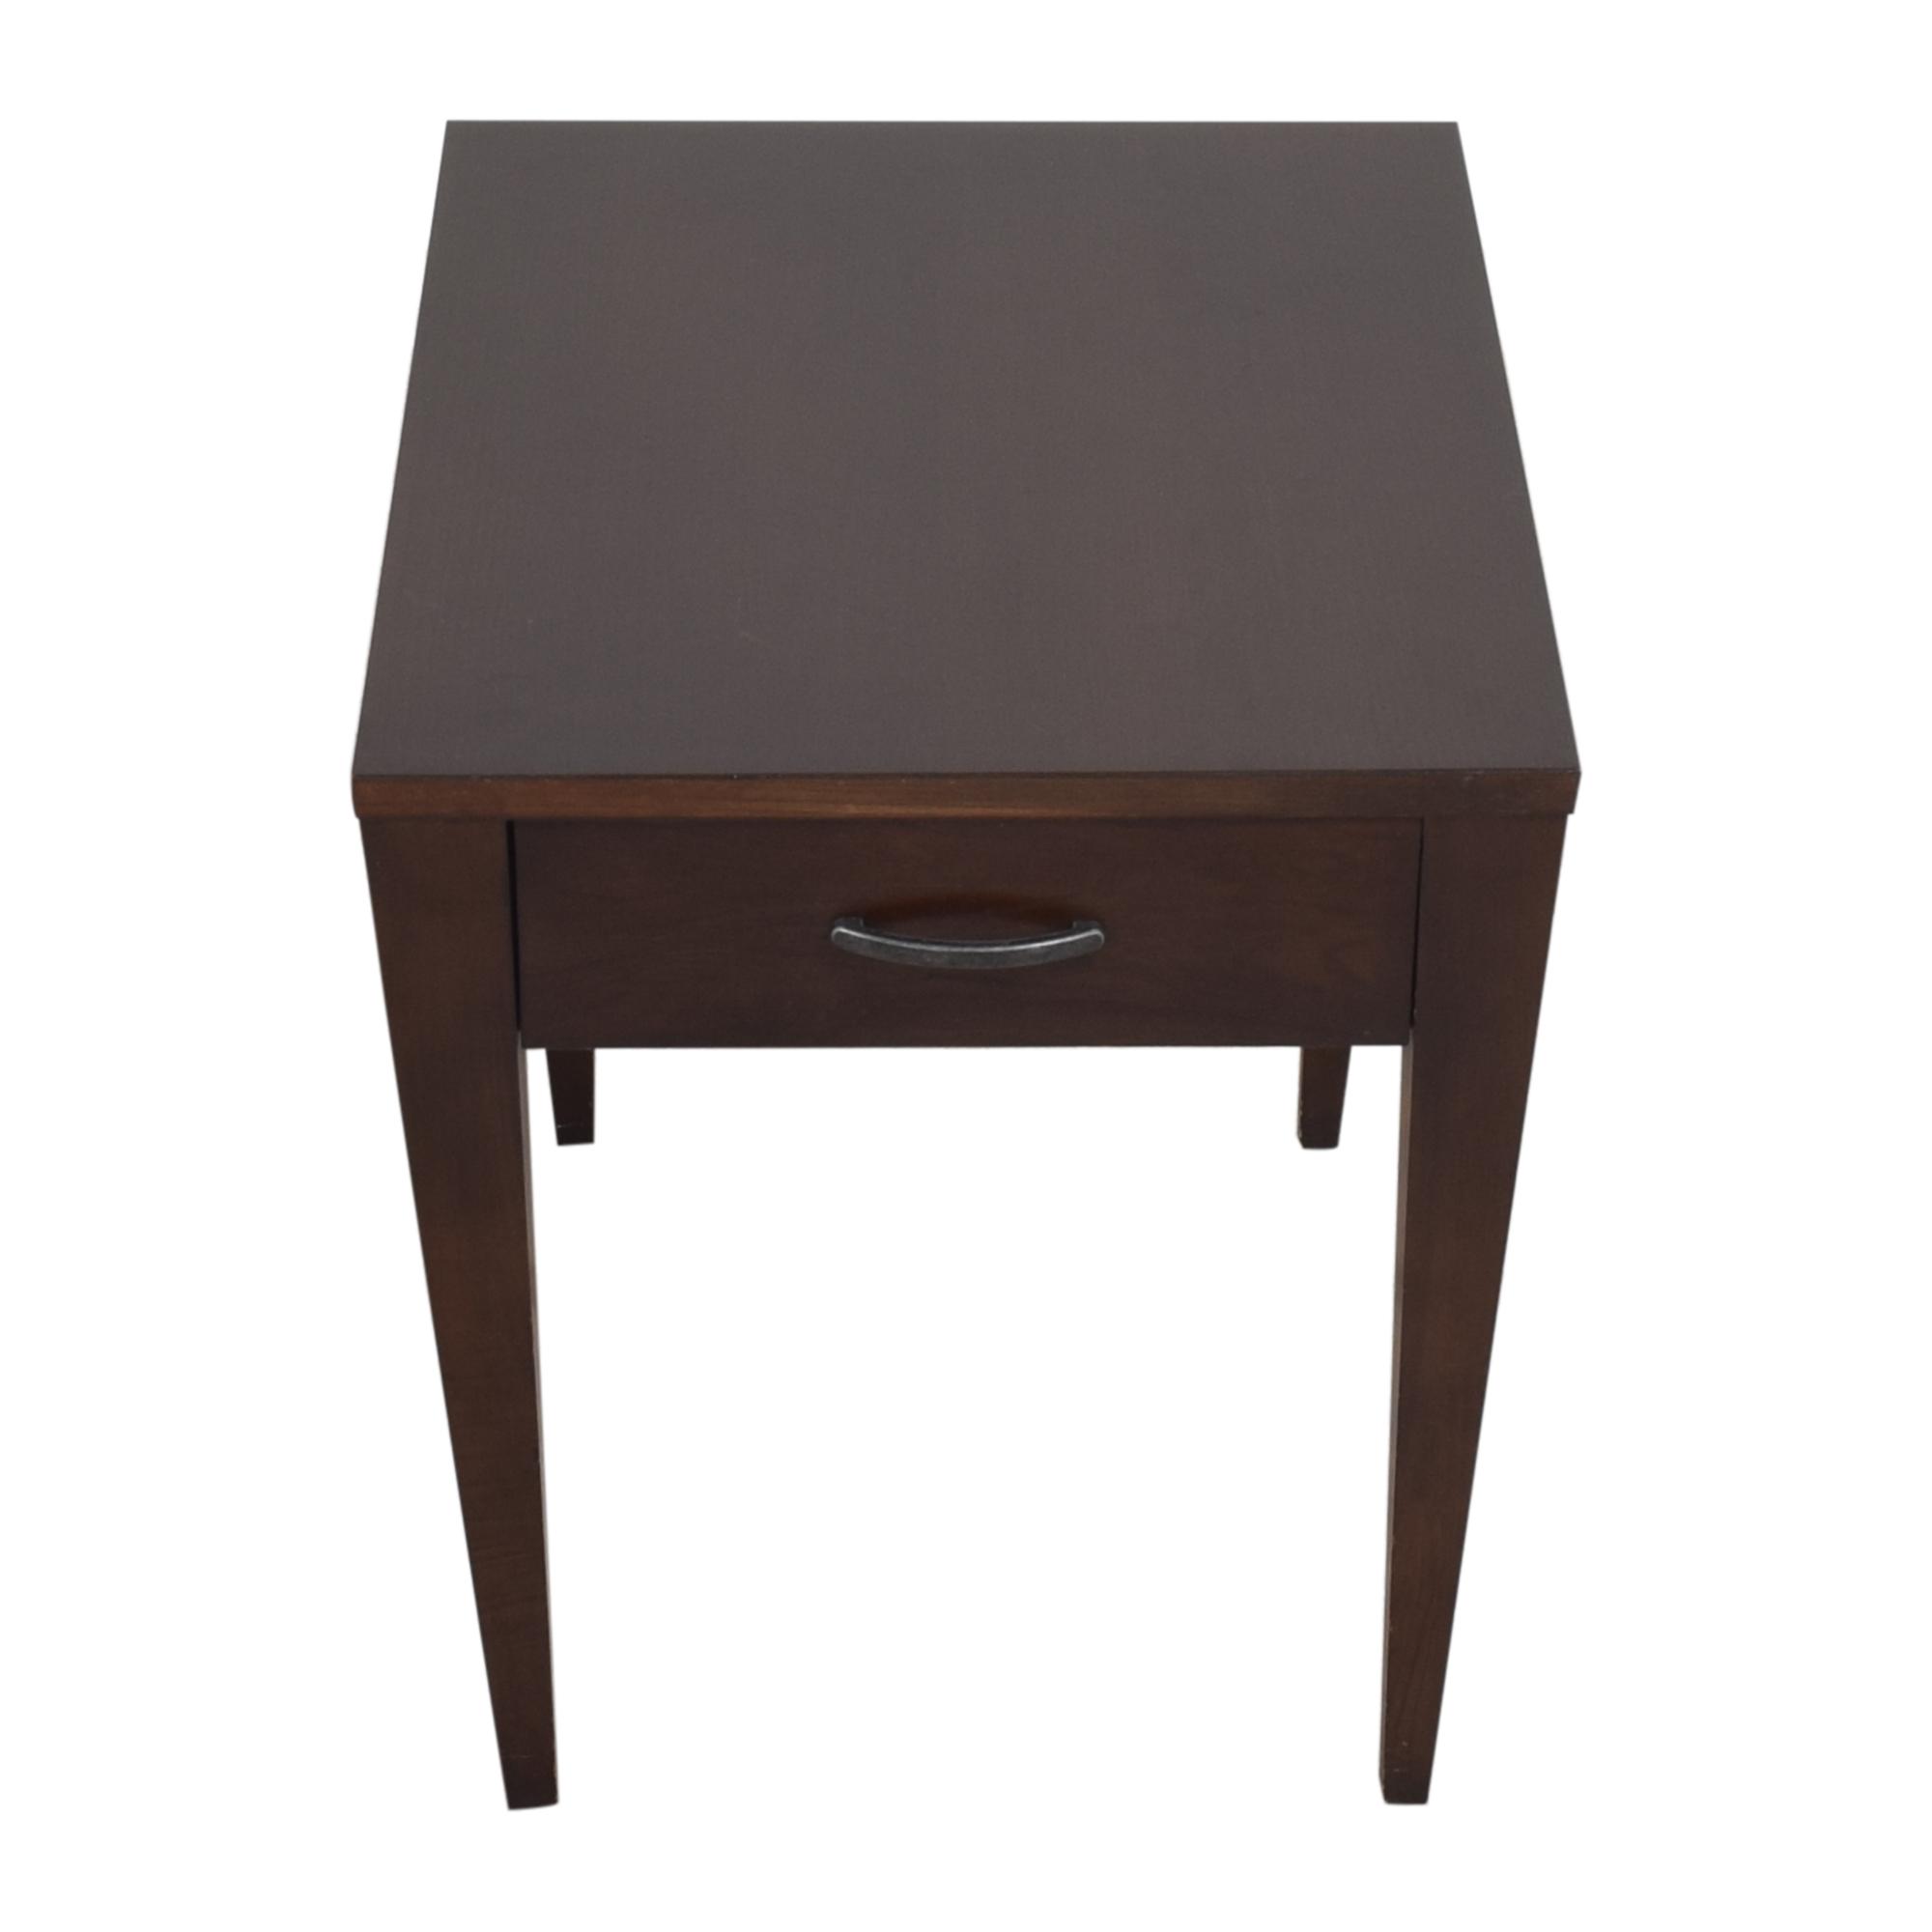 Ethan Allen Ethan Allen Horizons End Table Tables